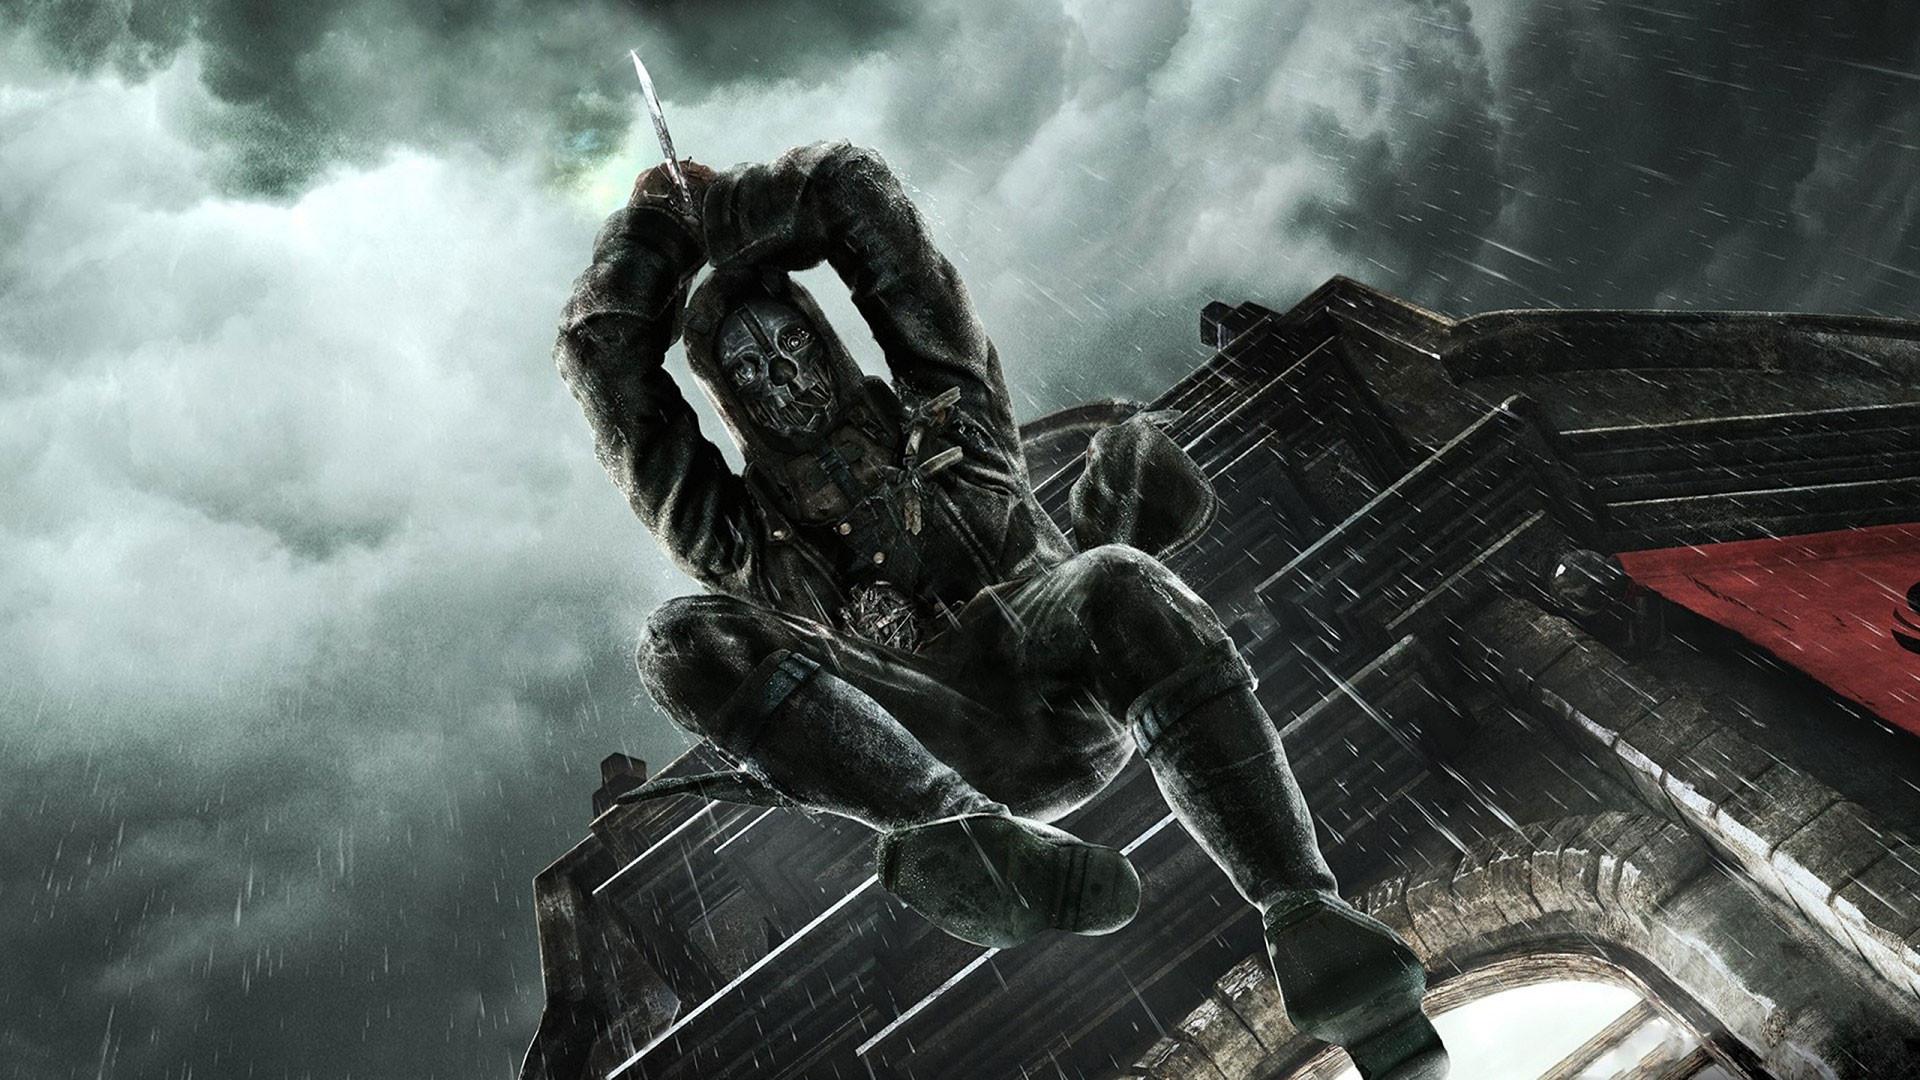 Dishonored 2 4K Wallpaper   Dishonored 2 1080p Wallpaper …